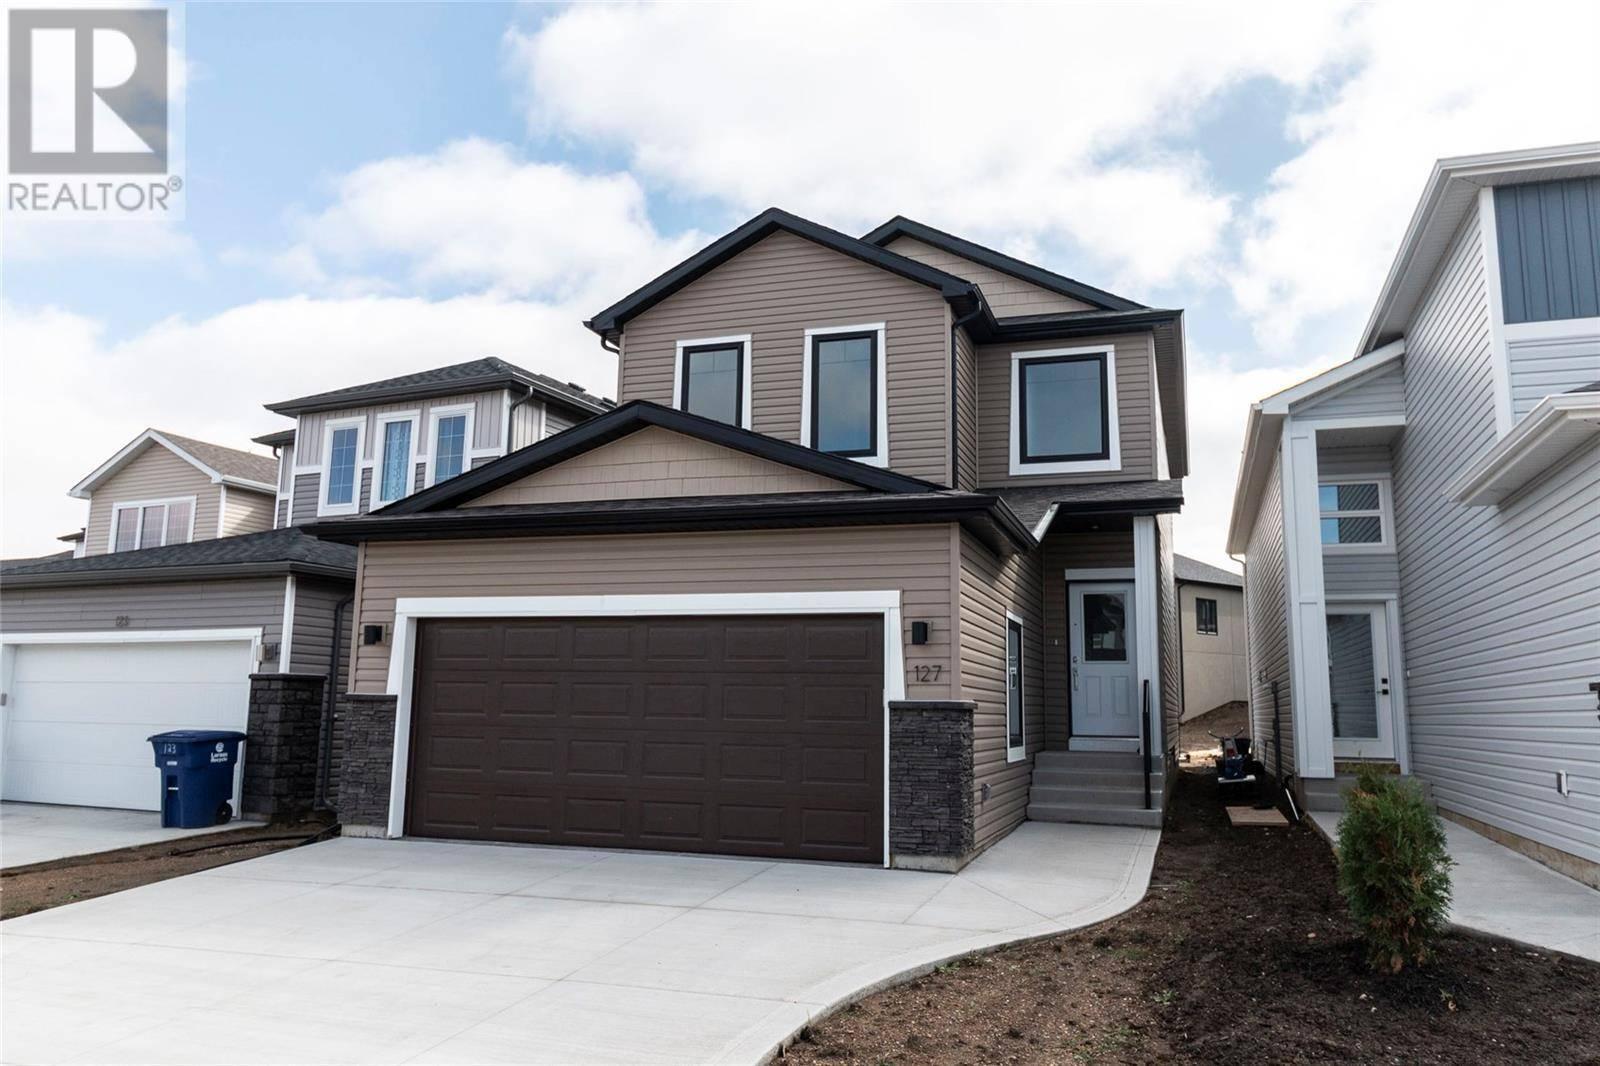 House for sale at 127 Burgess Cres Saskatoon Saskatchewan - MLS: SK787212